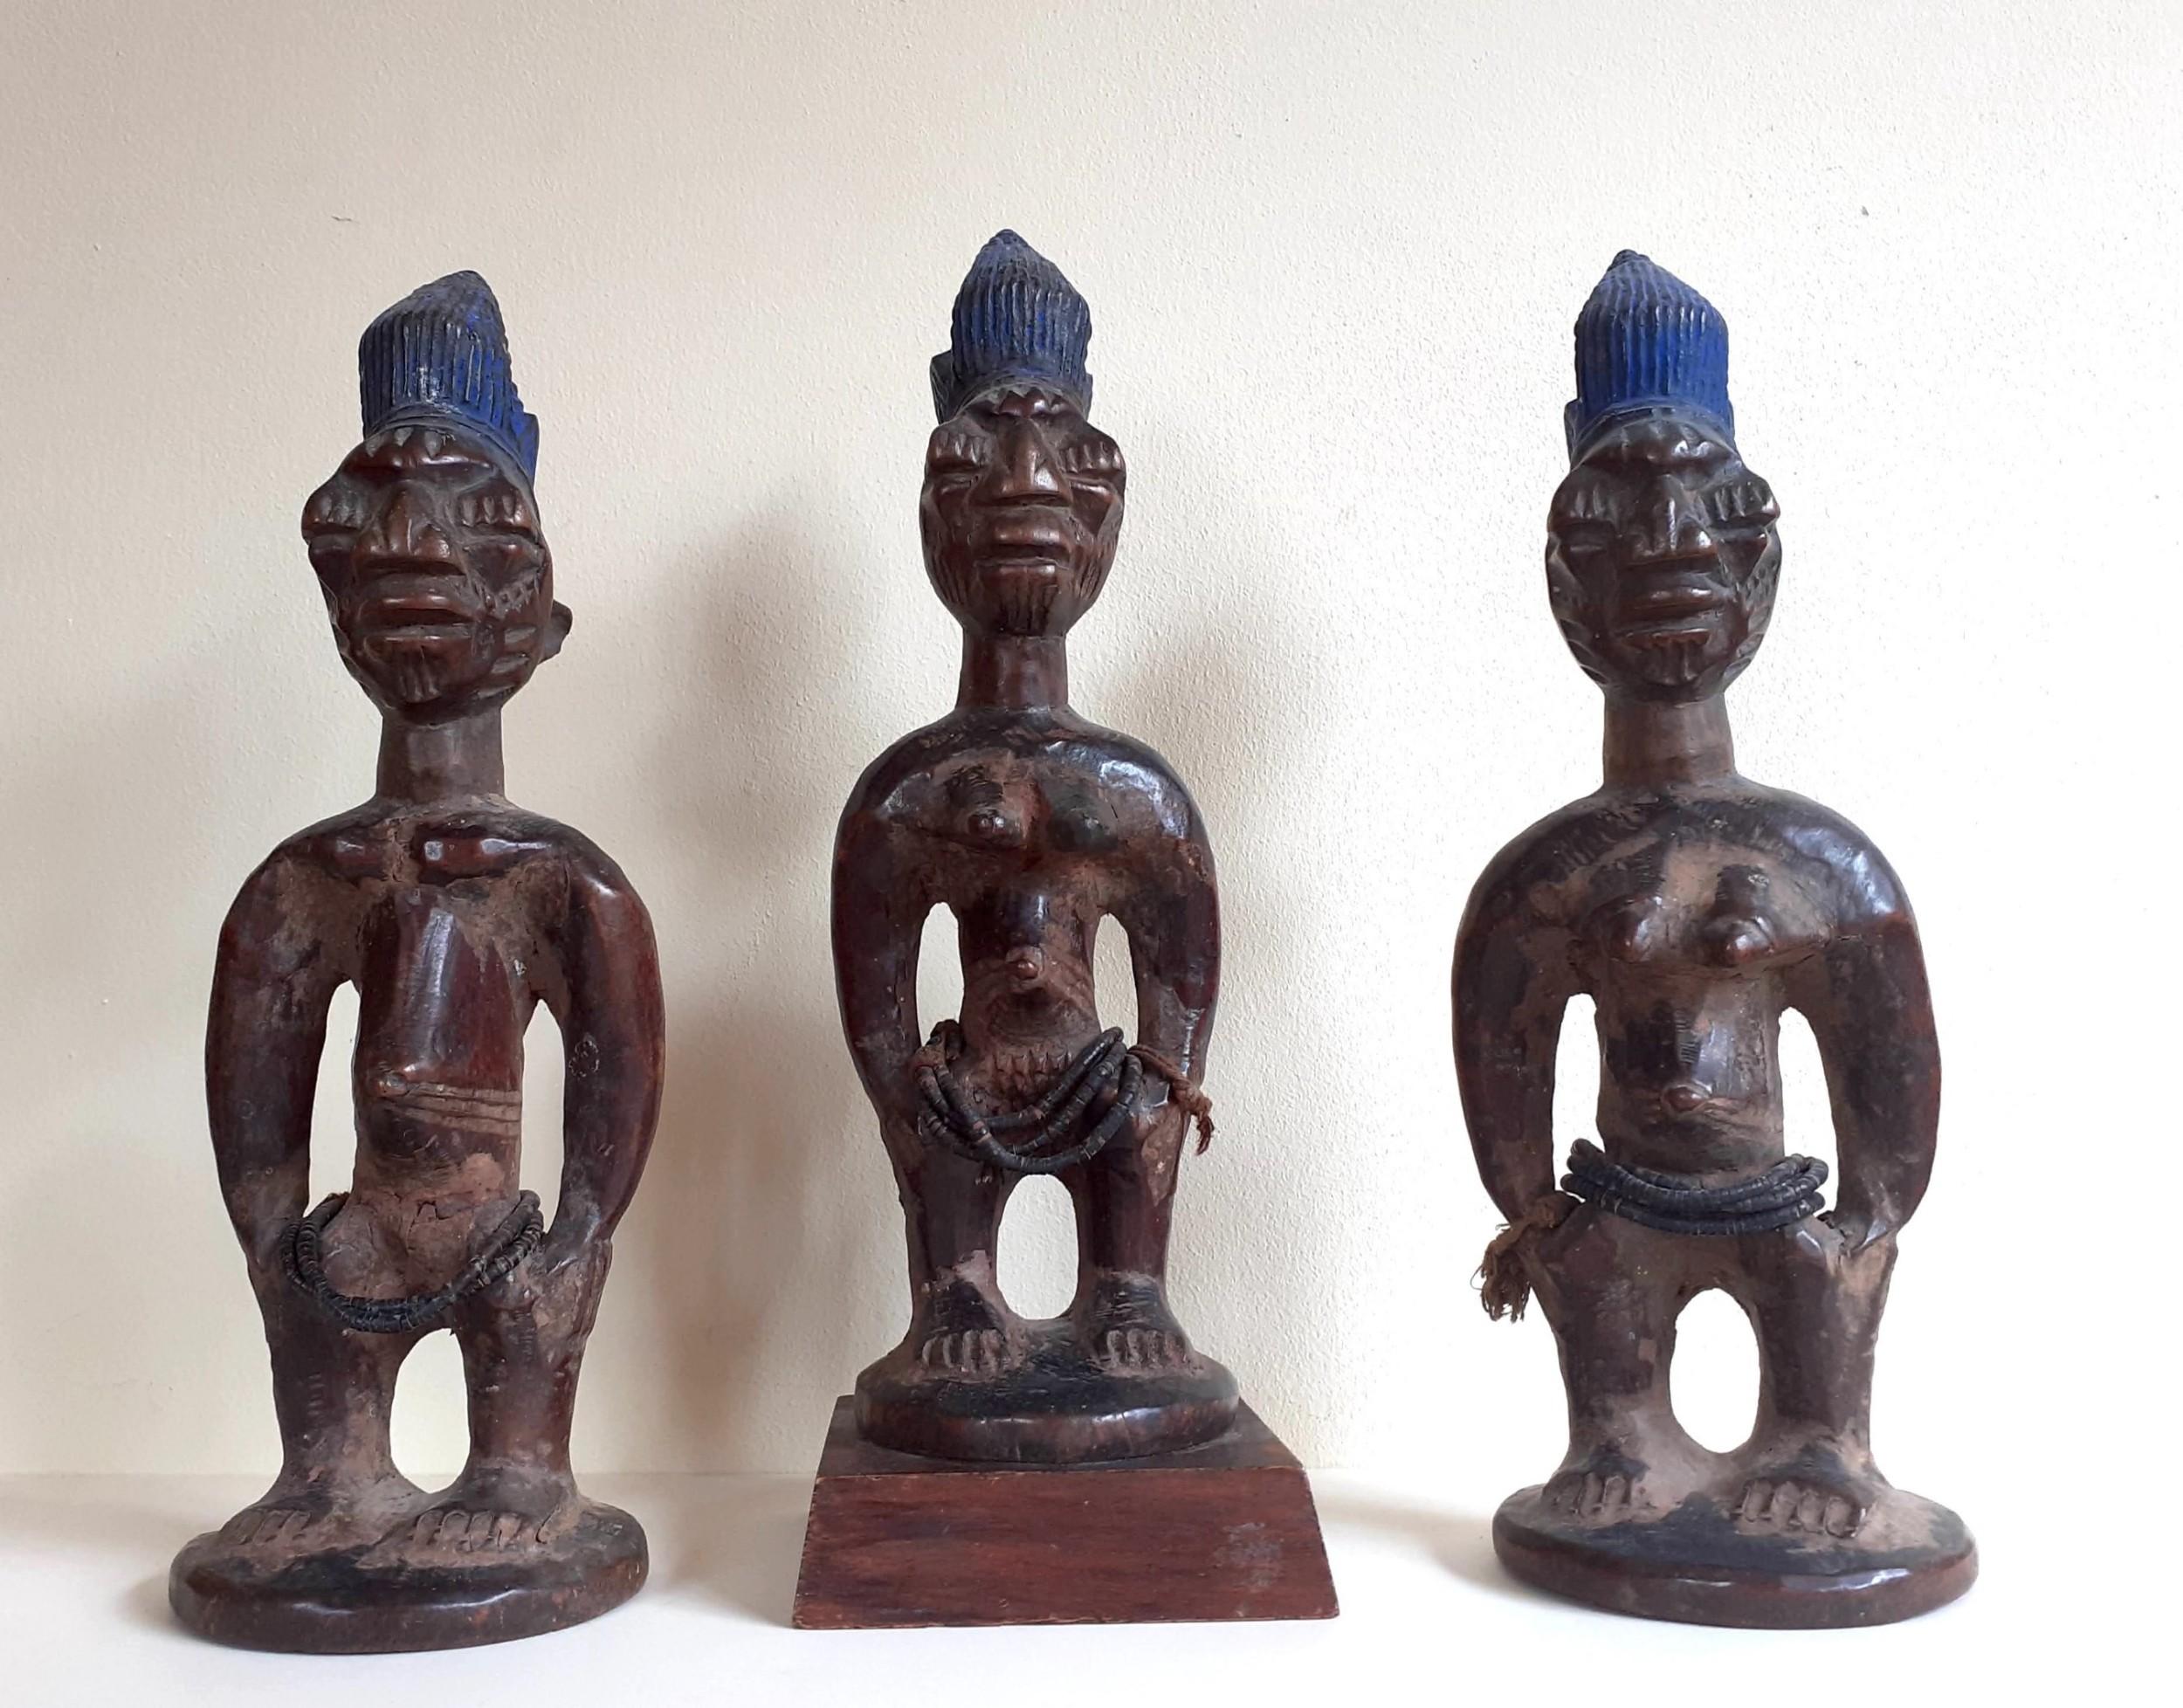 yoruba oyo ibeji triplets master carver abegunde of ede african tribal art prestigious provenance nigeria antique ibedji